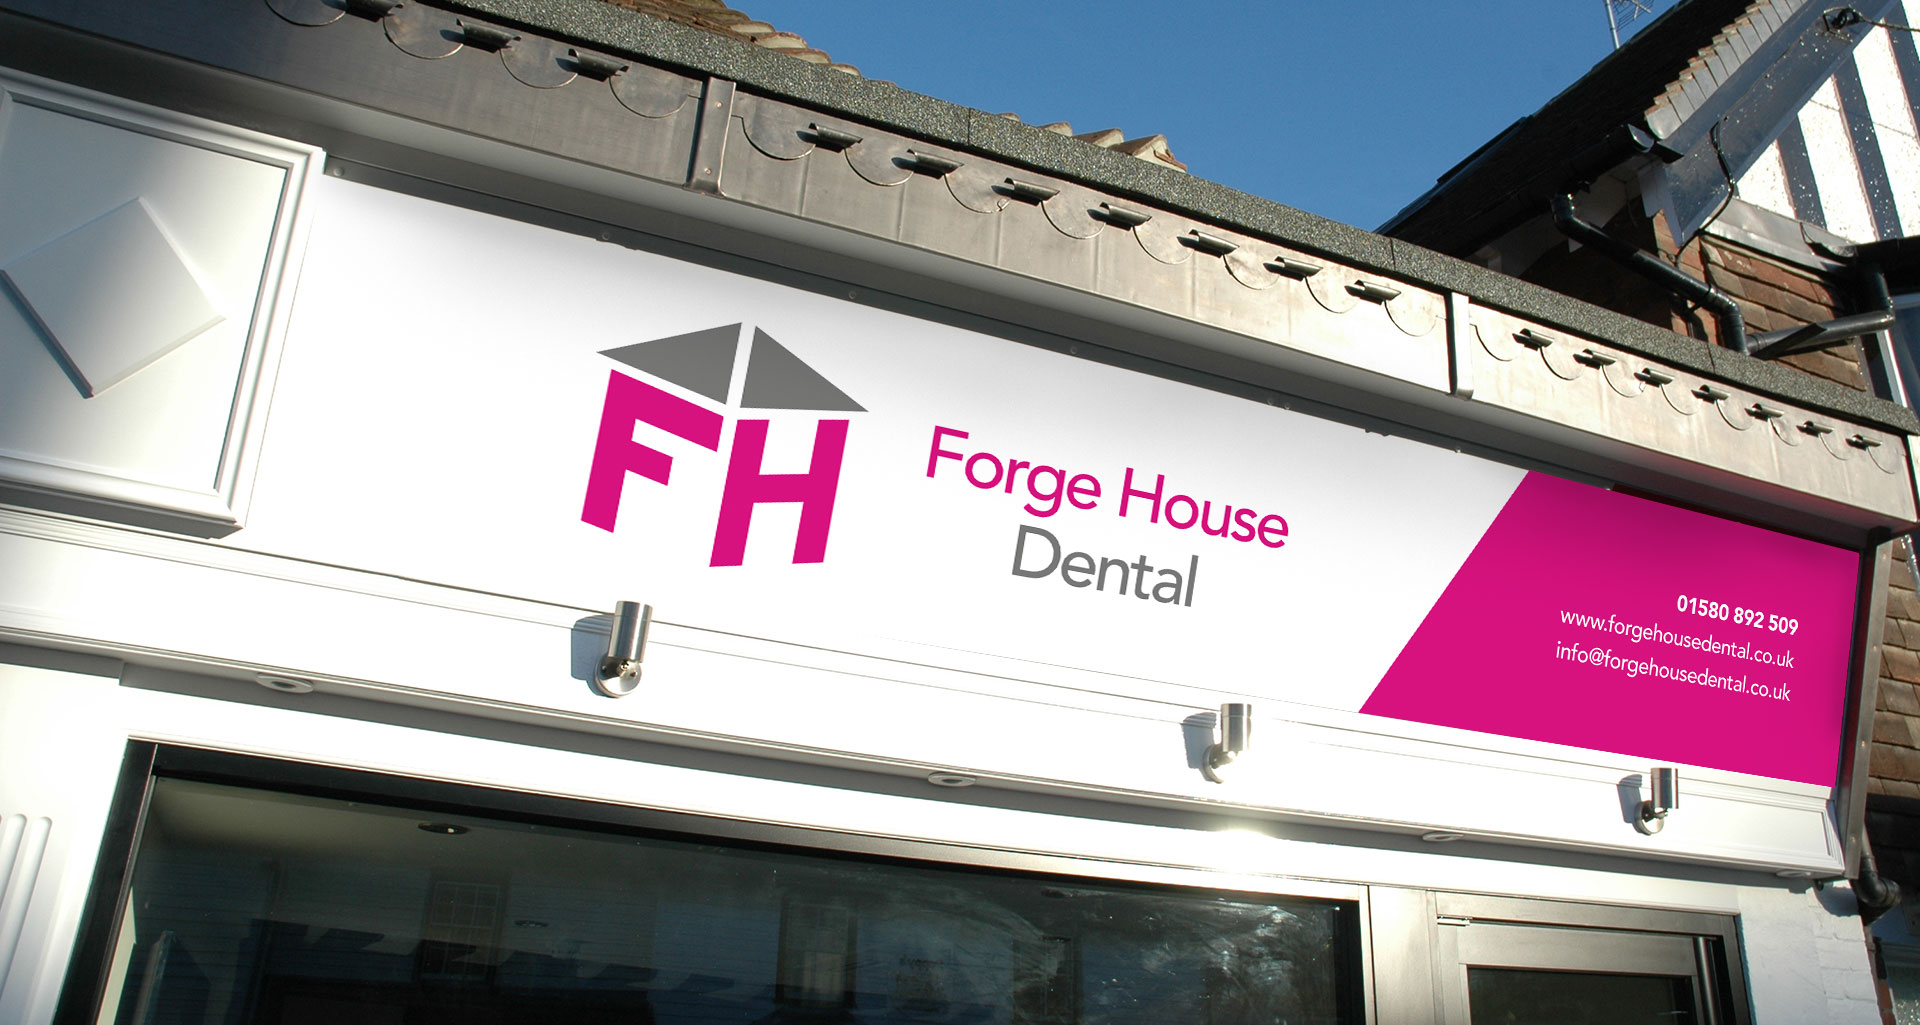 Forge House Dental Signage